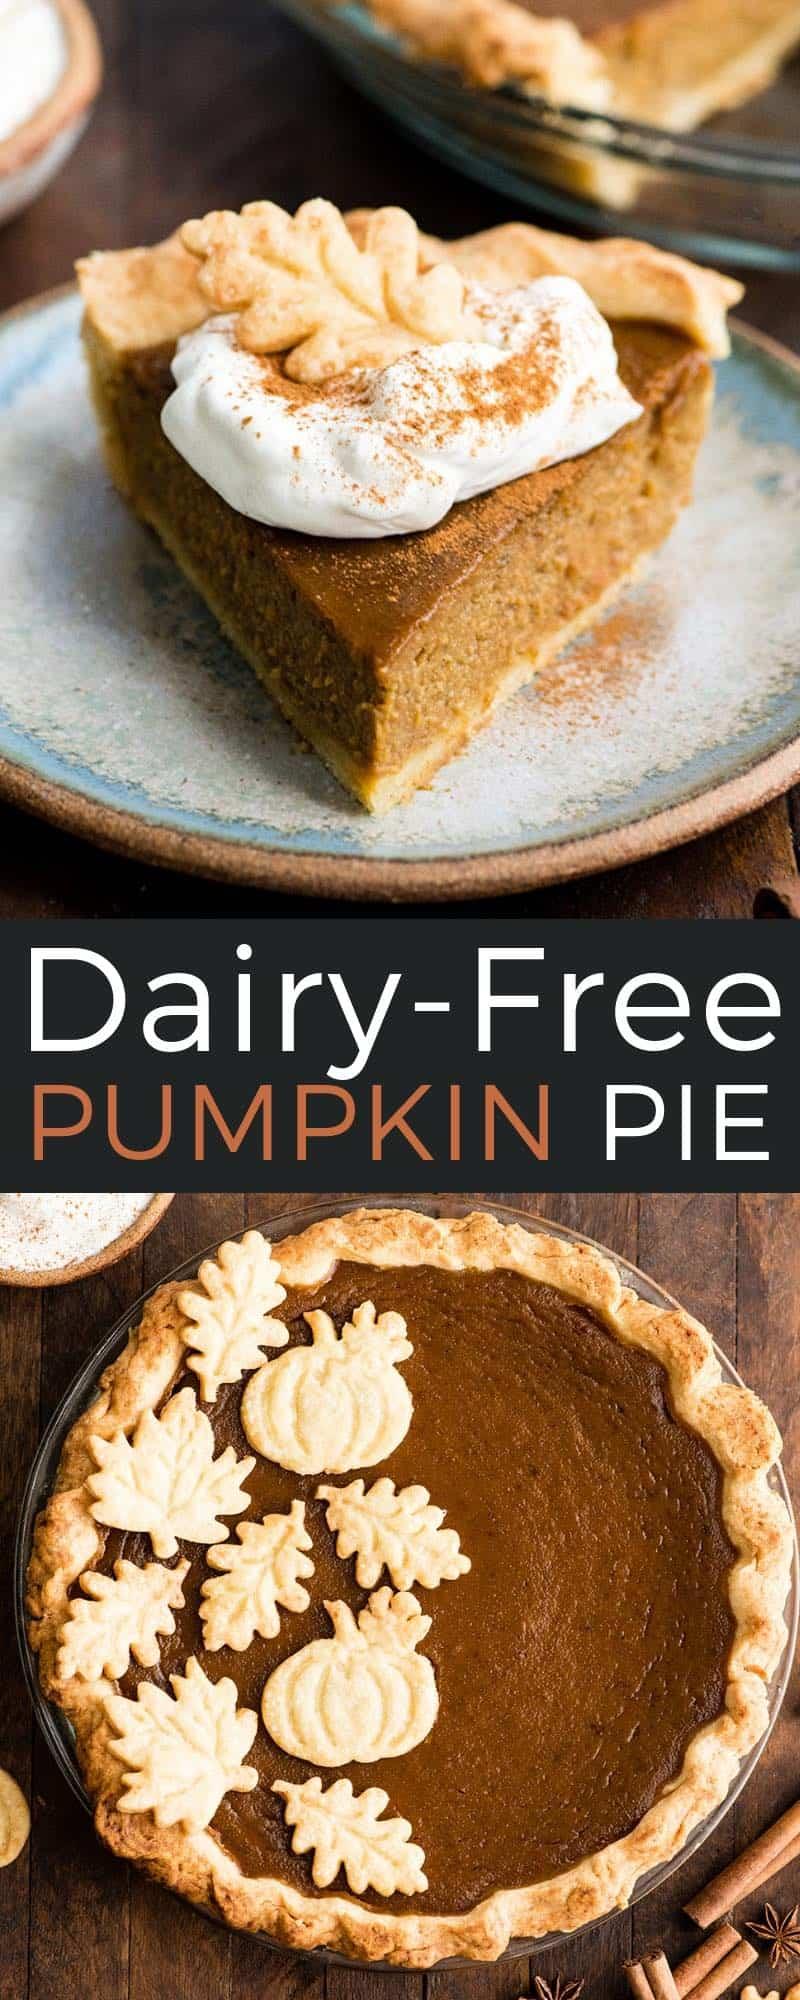 Homemade Dairy-Free Pumpkin Pie recipe from scratch! This coconut milk pumpkin pie is fresh, delicious & the perfect Thanksgiving dessert! #dairyfree #pumpkinpie #coconutmilk #thanksgiving #dessert #pie